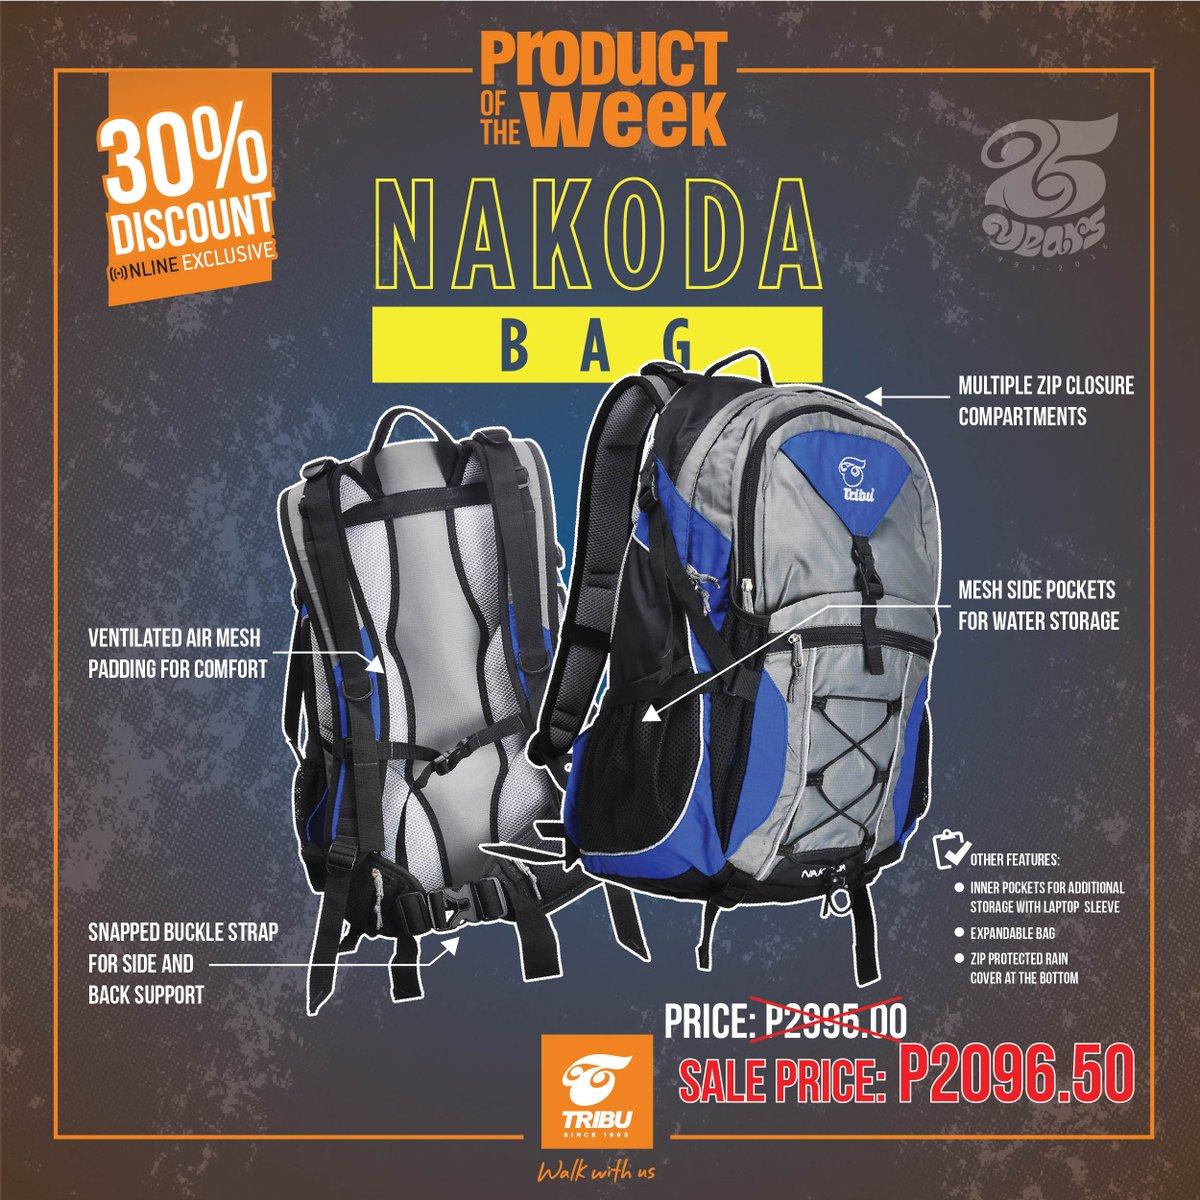 Valid only at http   tribunation.com ph shop men tribu-bag-nakoda  … until  supplies last!  Tribunation  WalkWithUspic.twitter.com PkMQD6wwlq 29435c70e892c